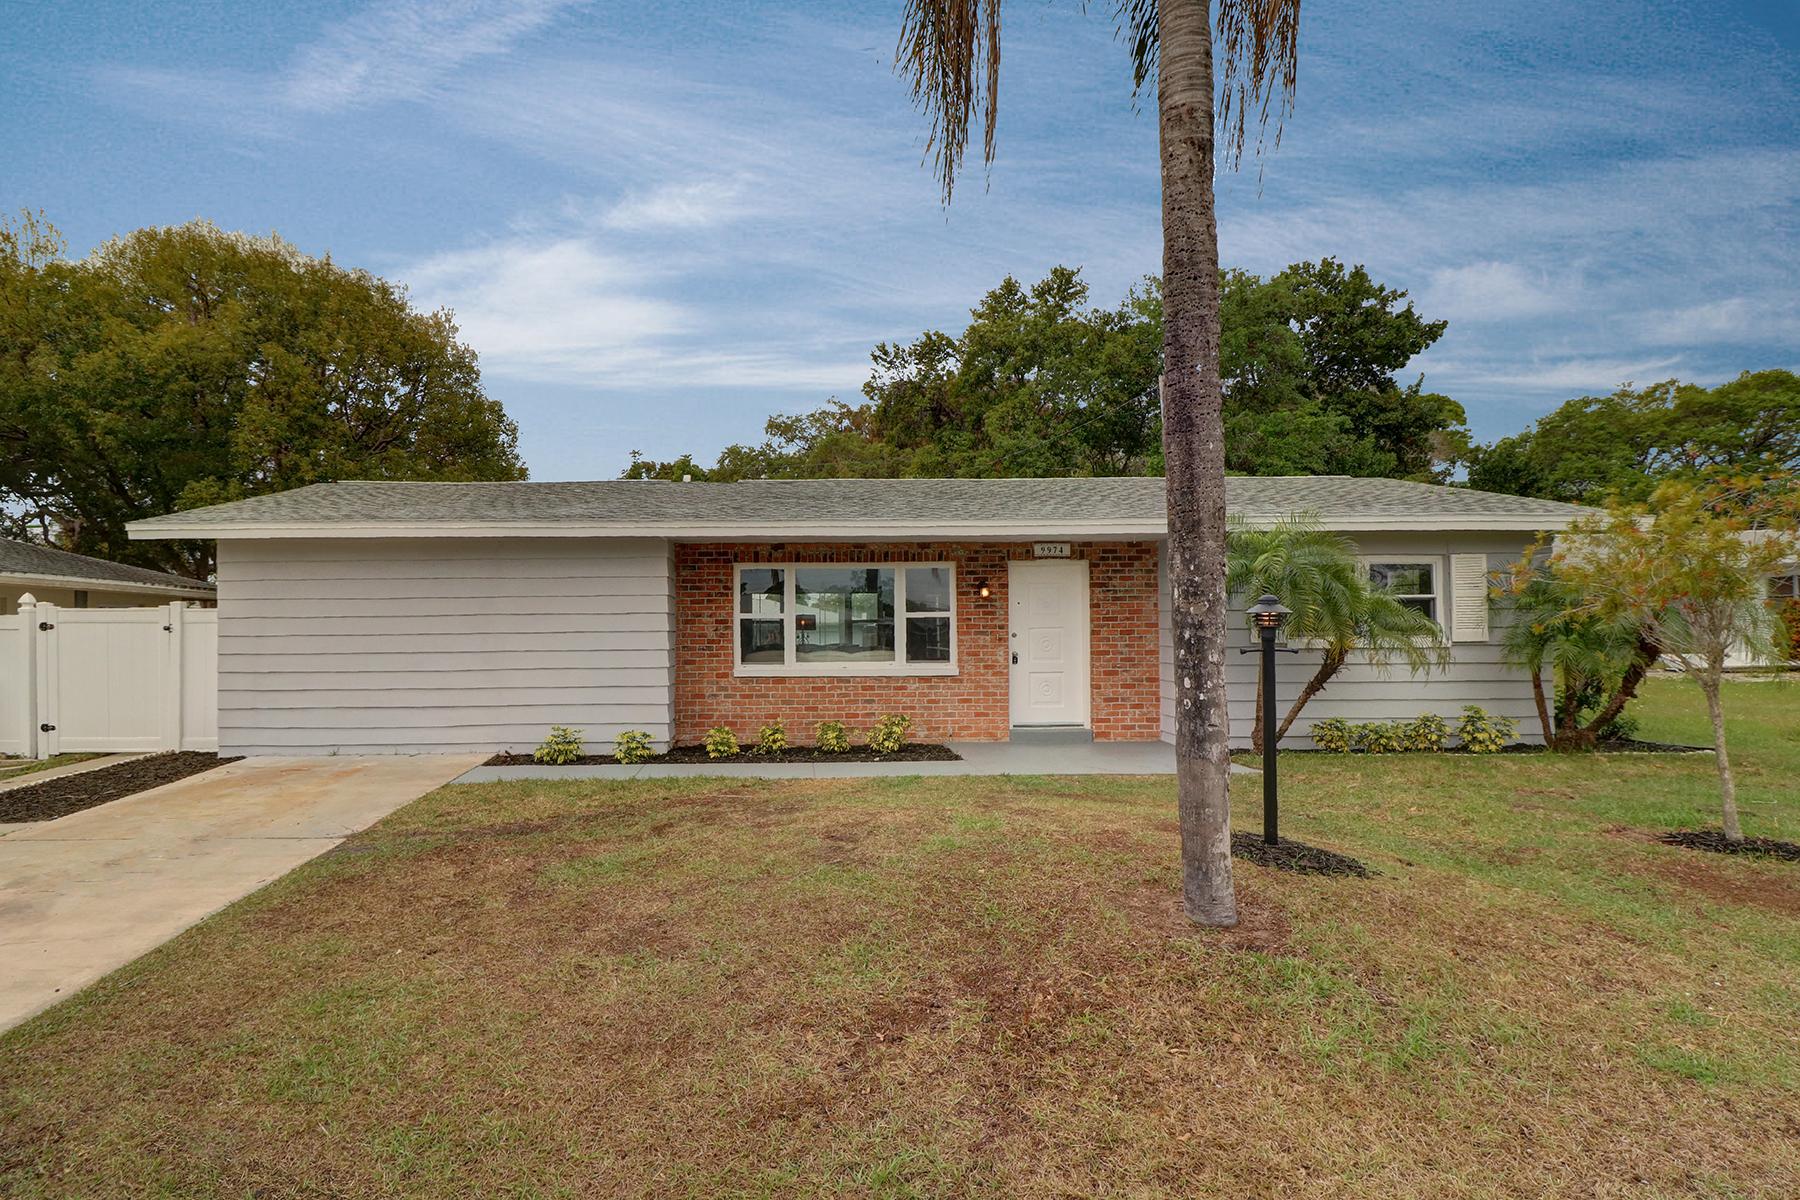 Single Family Home for Sale at SEMINOLE 9974 108th St Seminole, Florida, 33772 United States